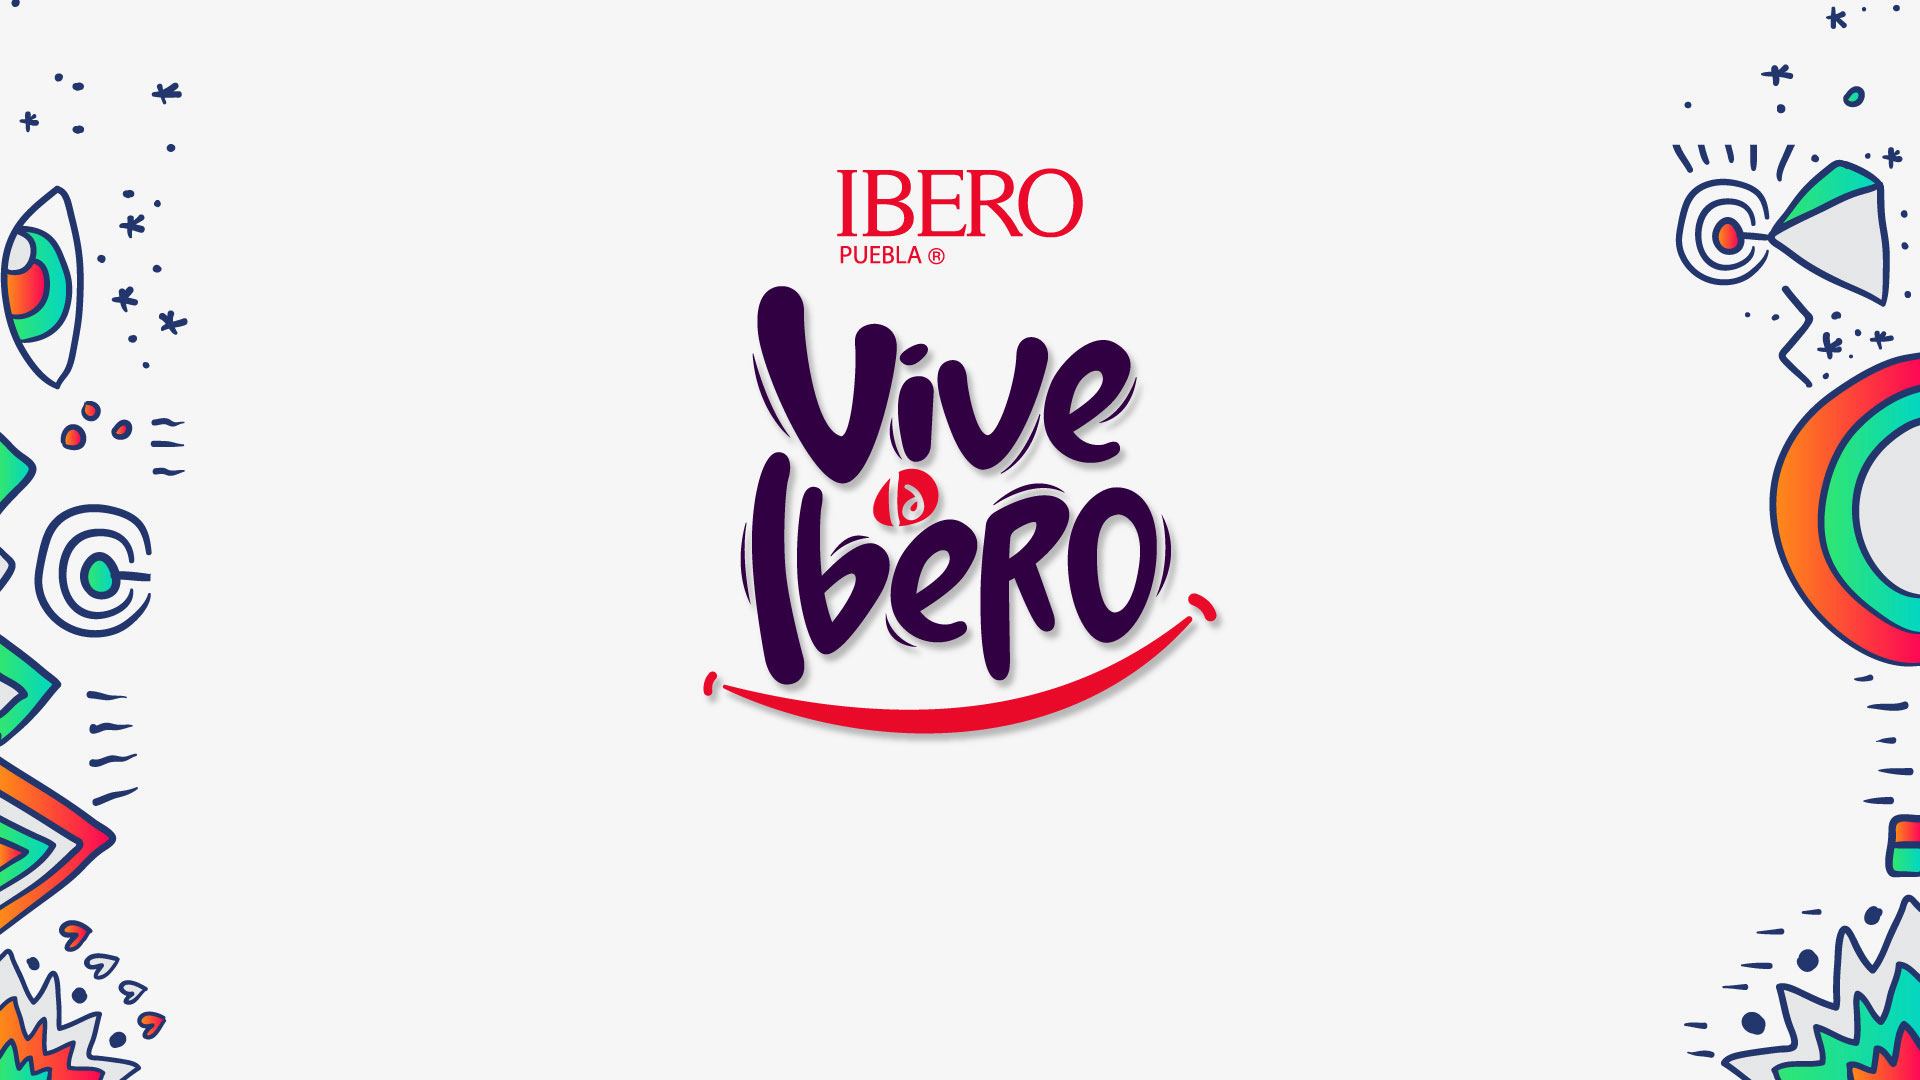 Viveo21backregistro16328593681632859368